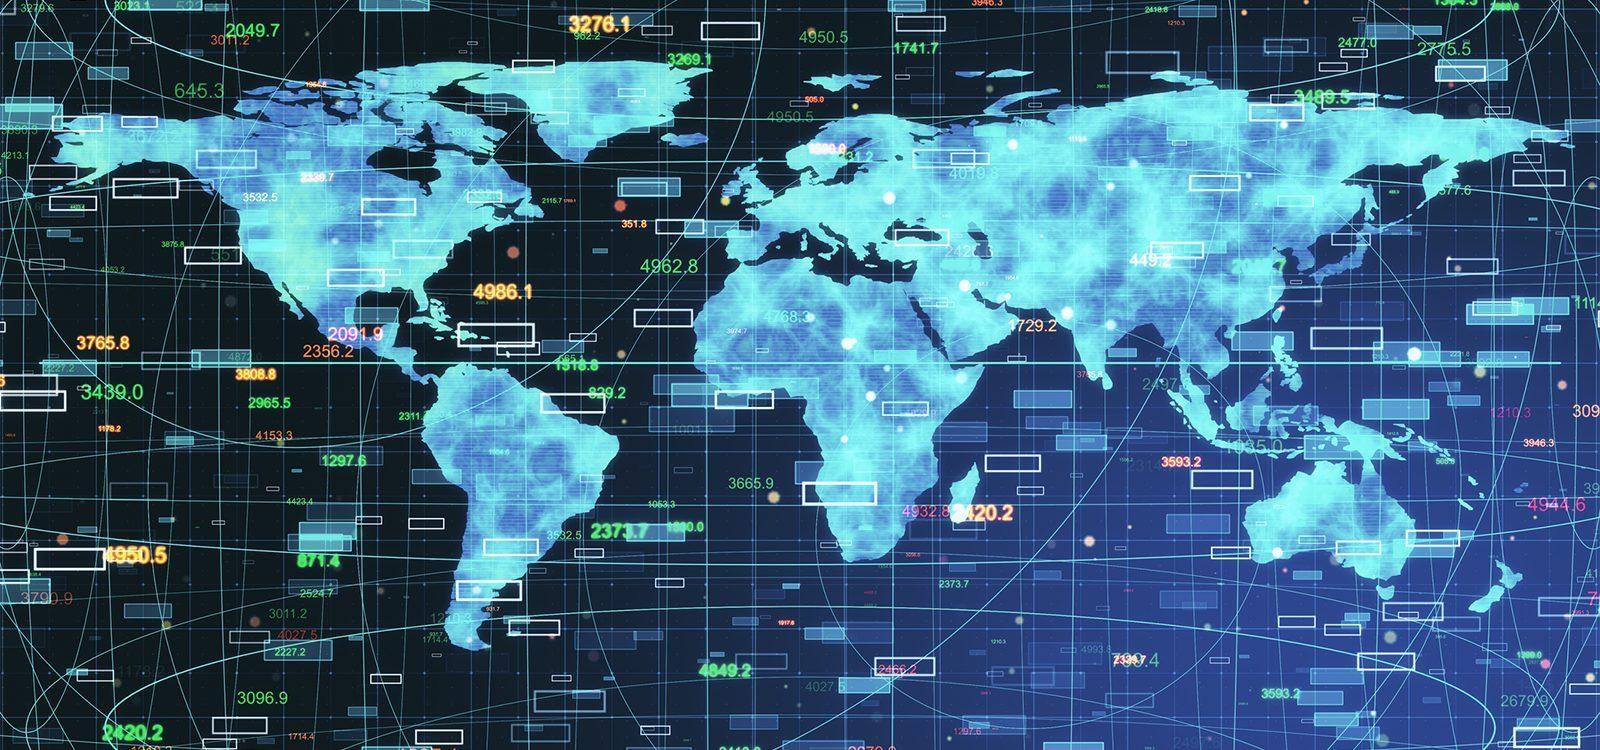 Actuaries Digital download and print edition – April 2021